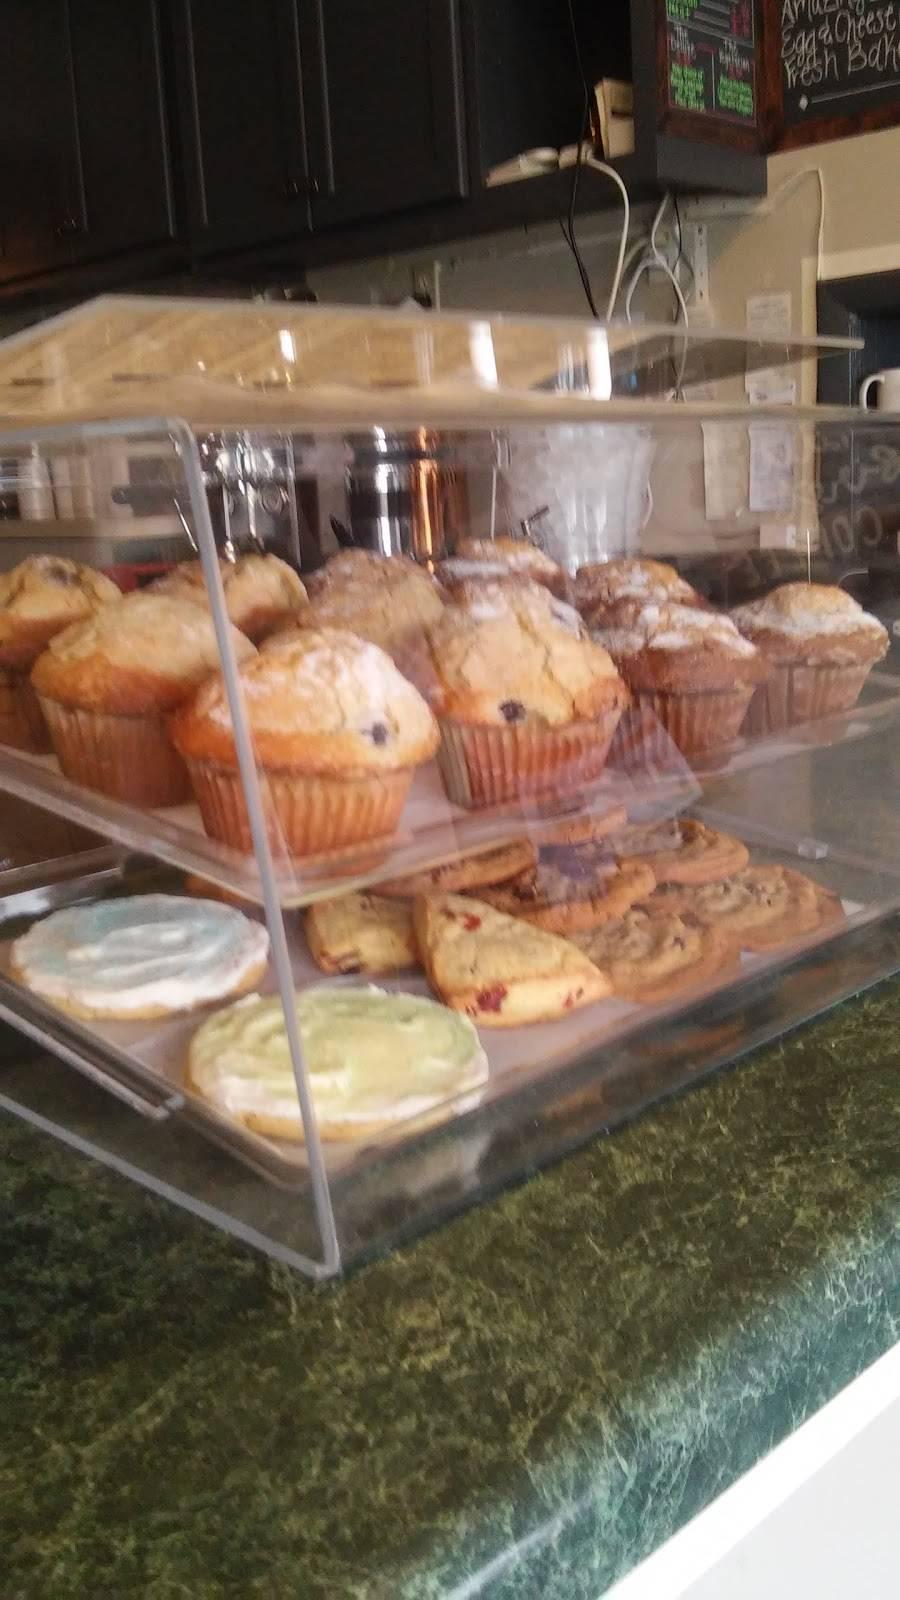 Liberty Street Cafe   cafe   511 Liberty St, Morris, IL 60450, USA   8159414355 OR +1 815-941-4355